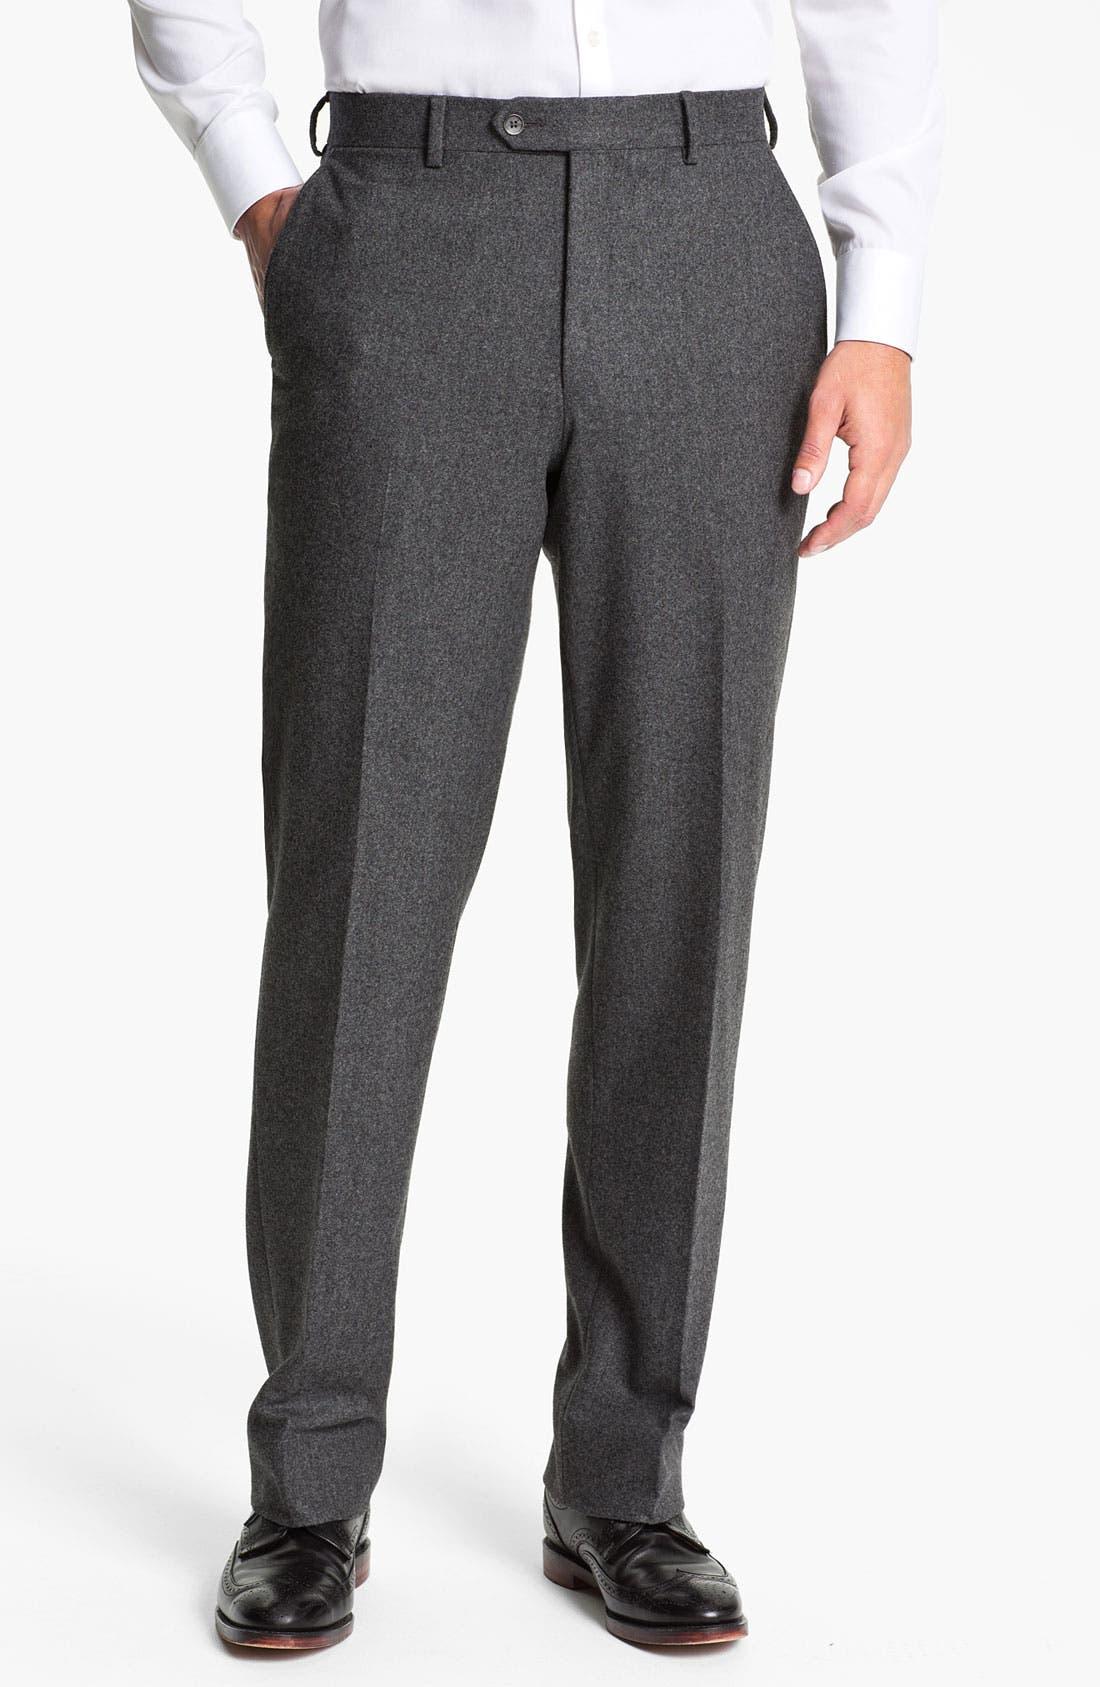 Main Image - Robert Talbott Flat Front Wool Trousers